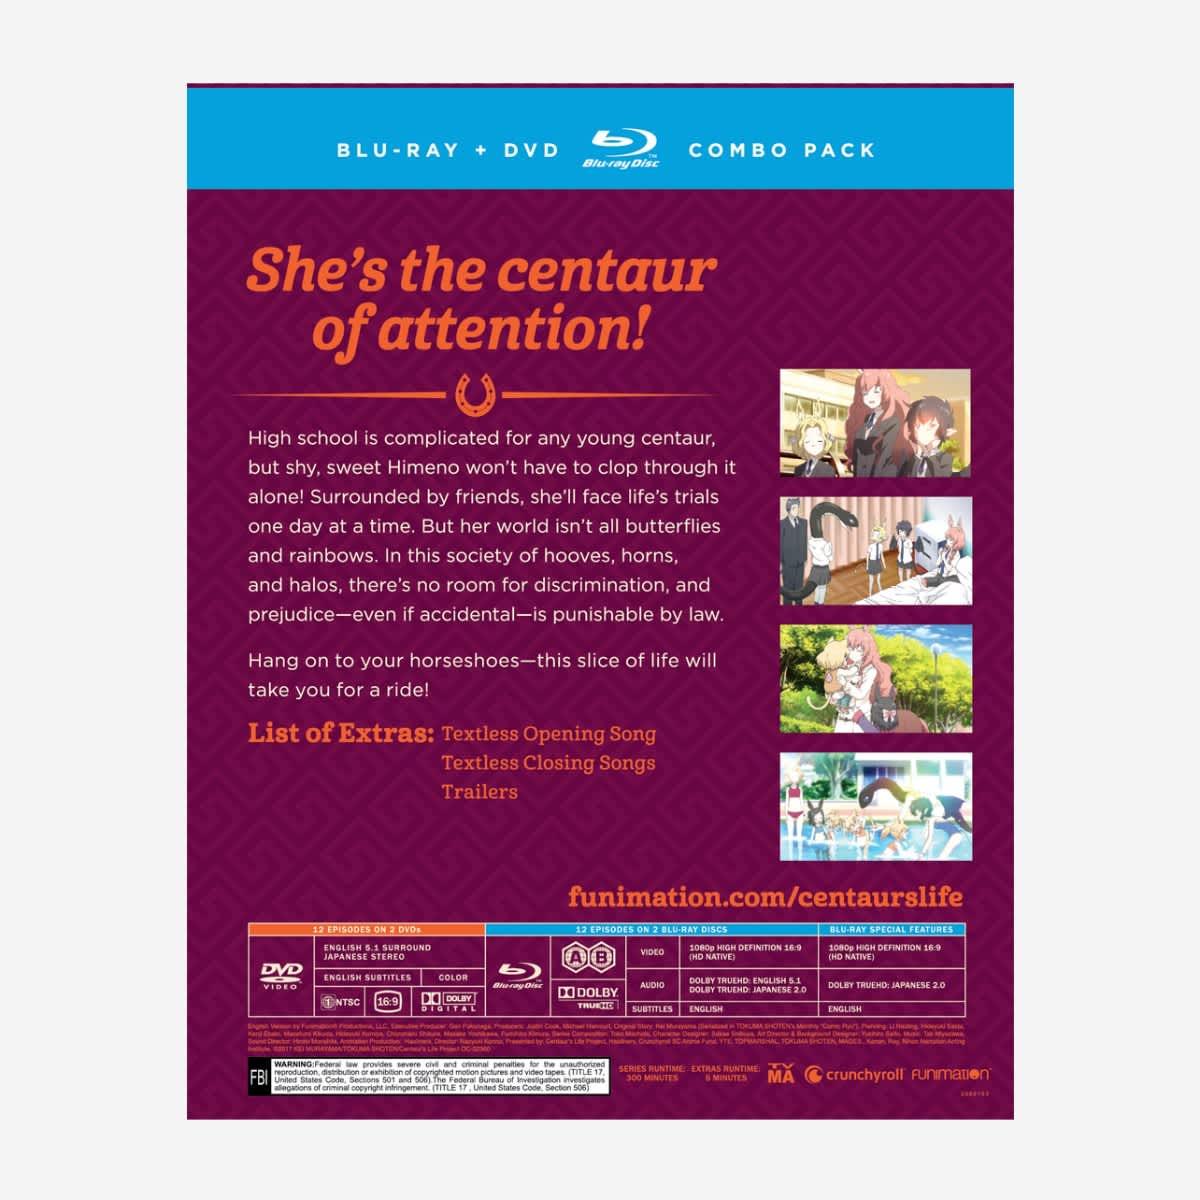 A Centaur's Life Blu-ray/DVD